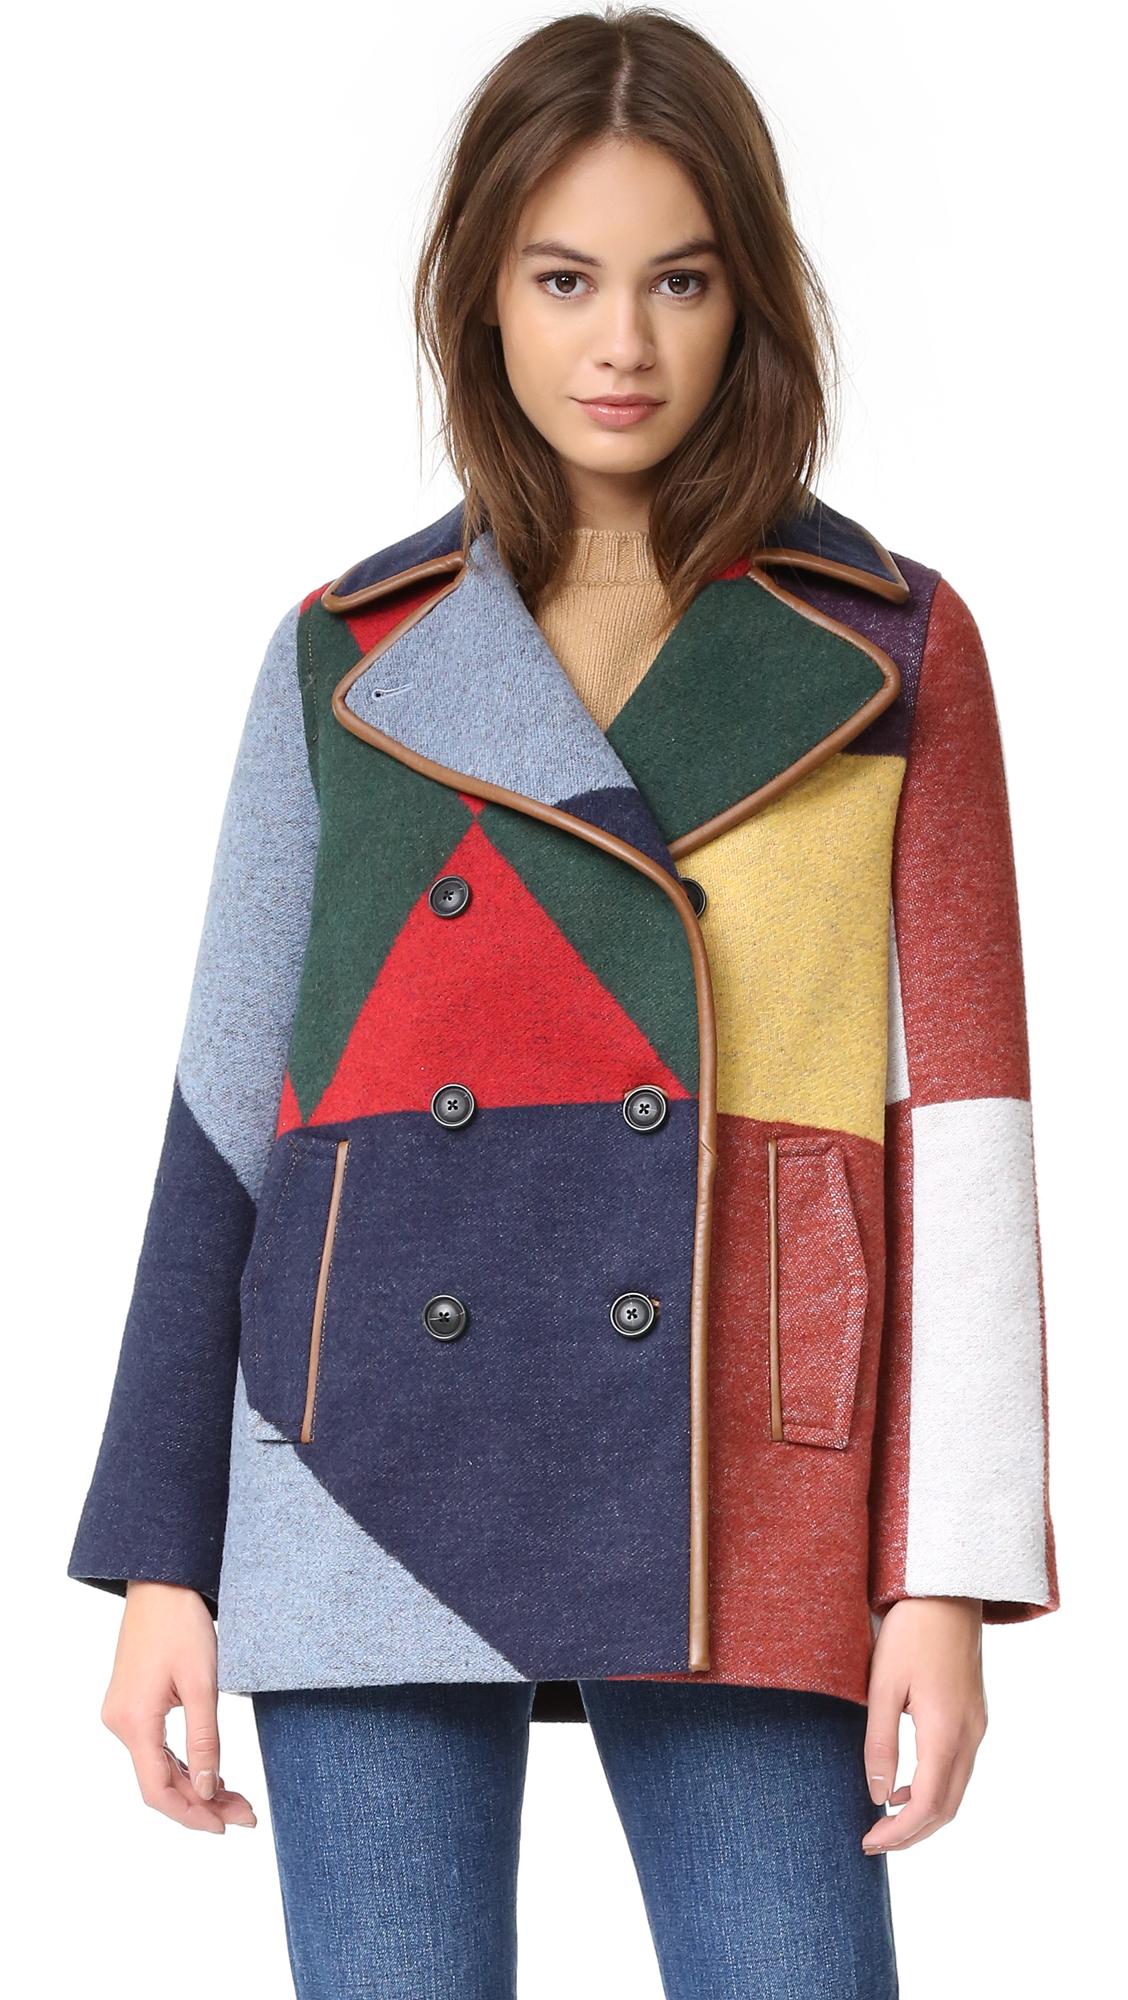 Tory Burch Cheval Pea Coat  c32d8633165fa